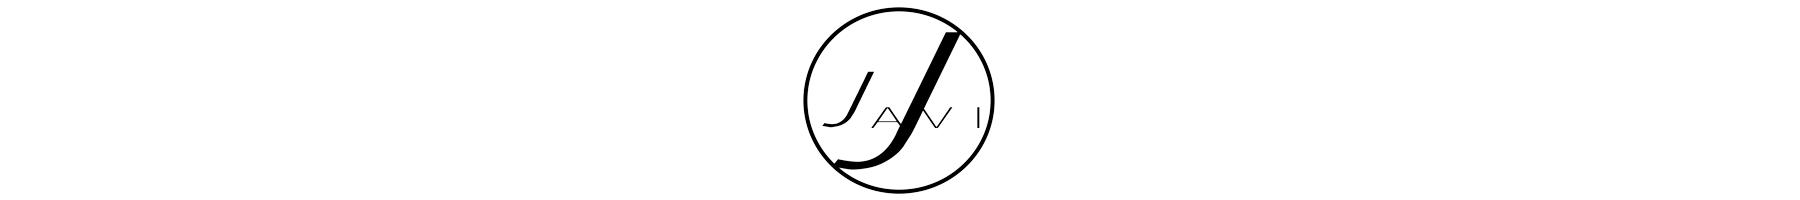 DrJays.com - Javi